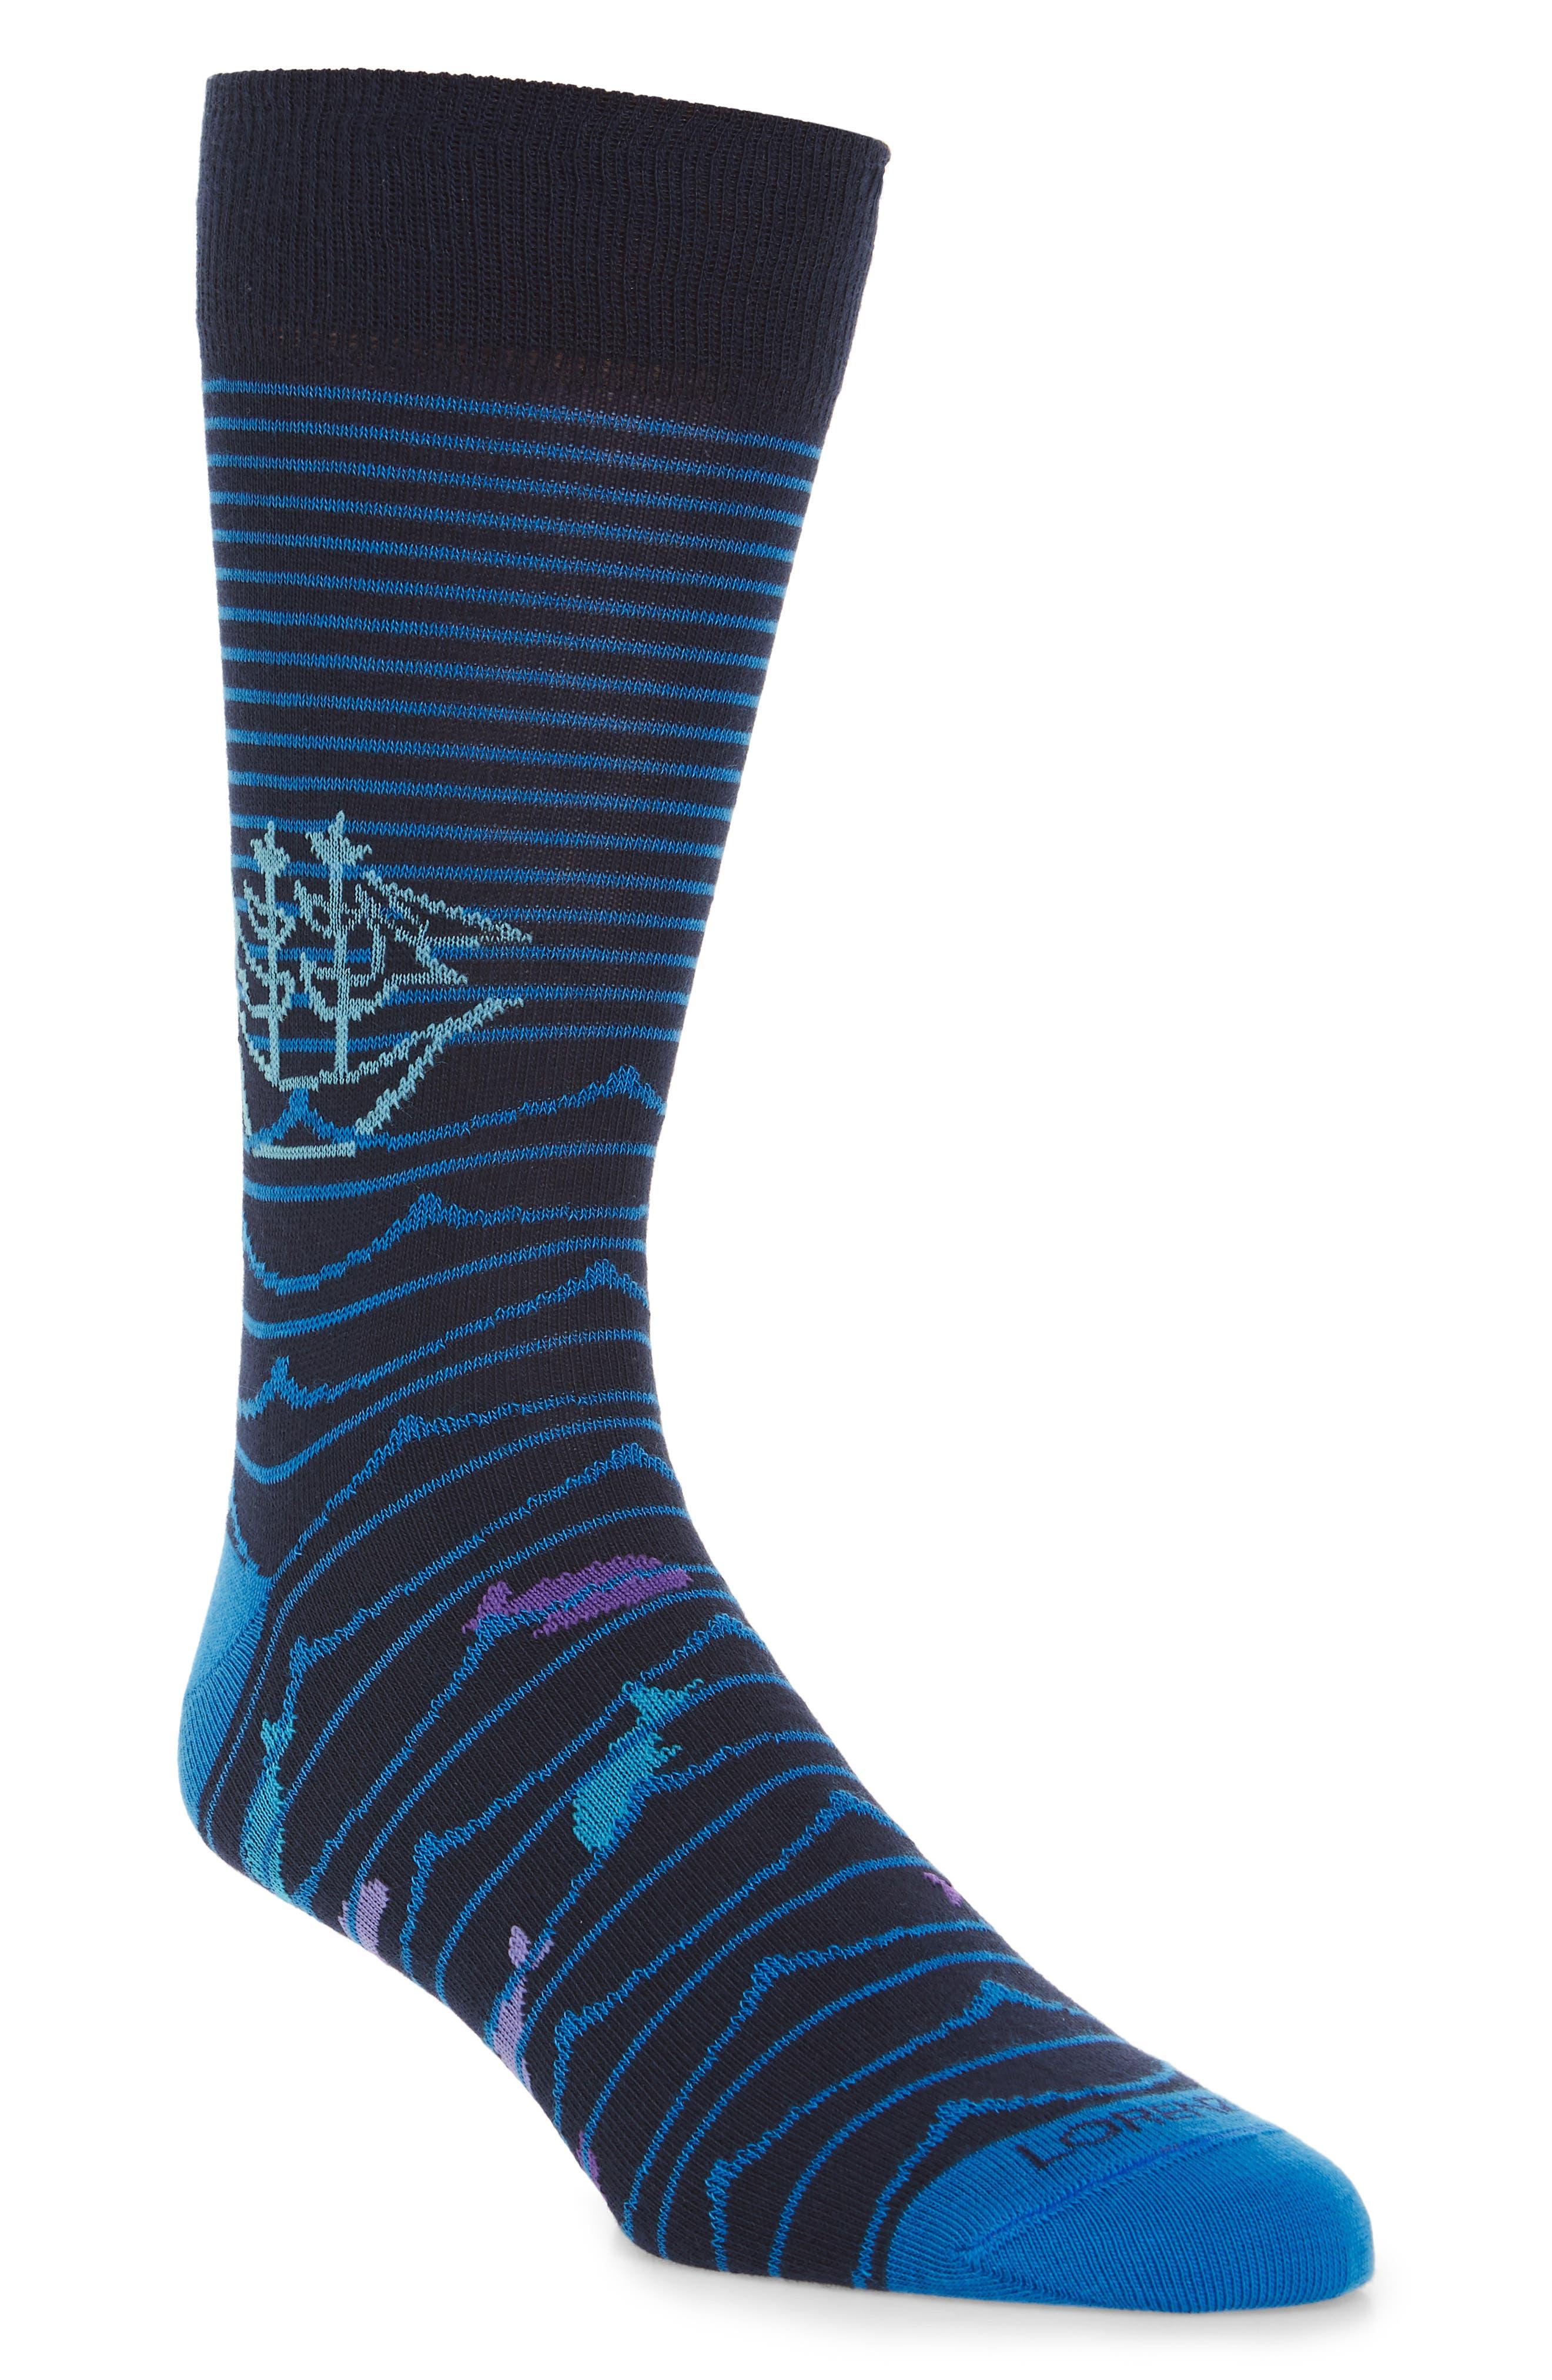 Pirate Ship Socks,                             Main thumbnail 1, color,